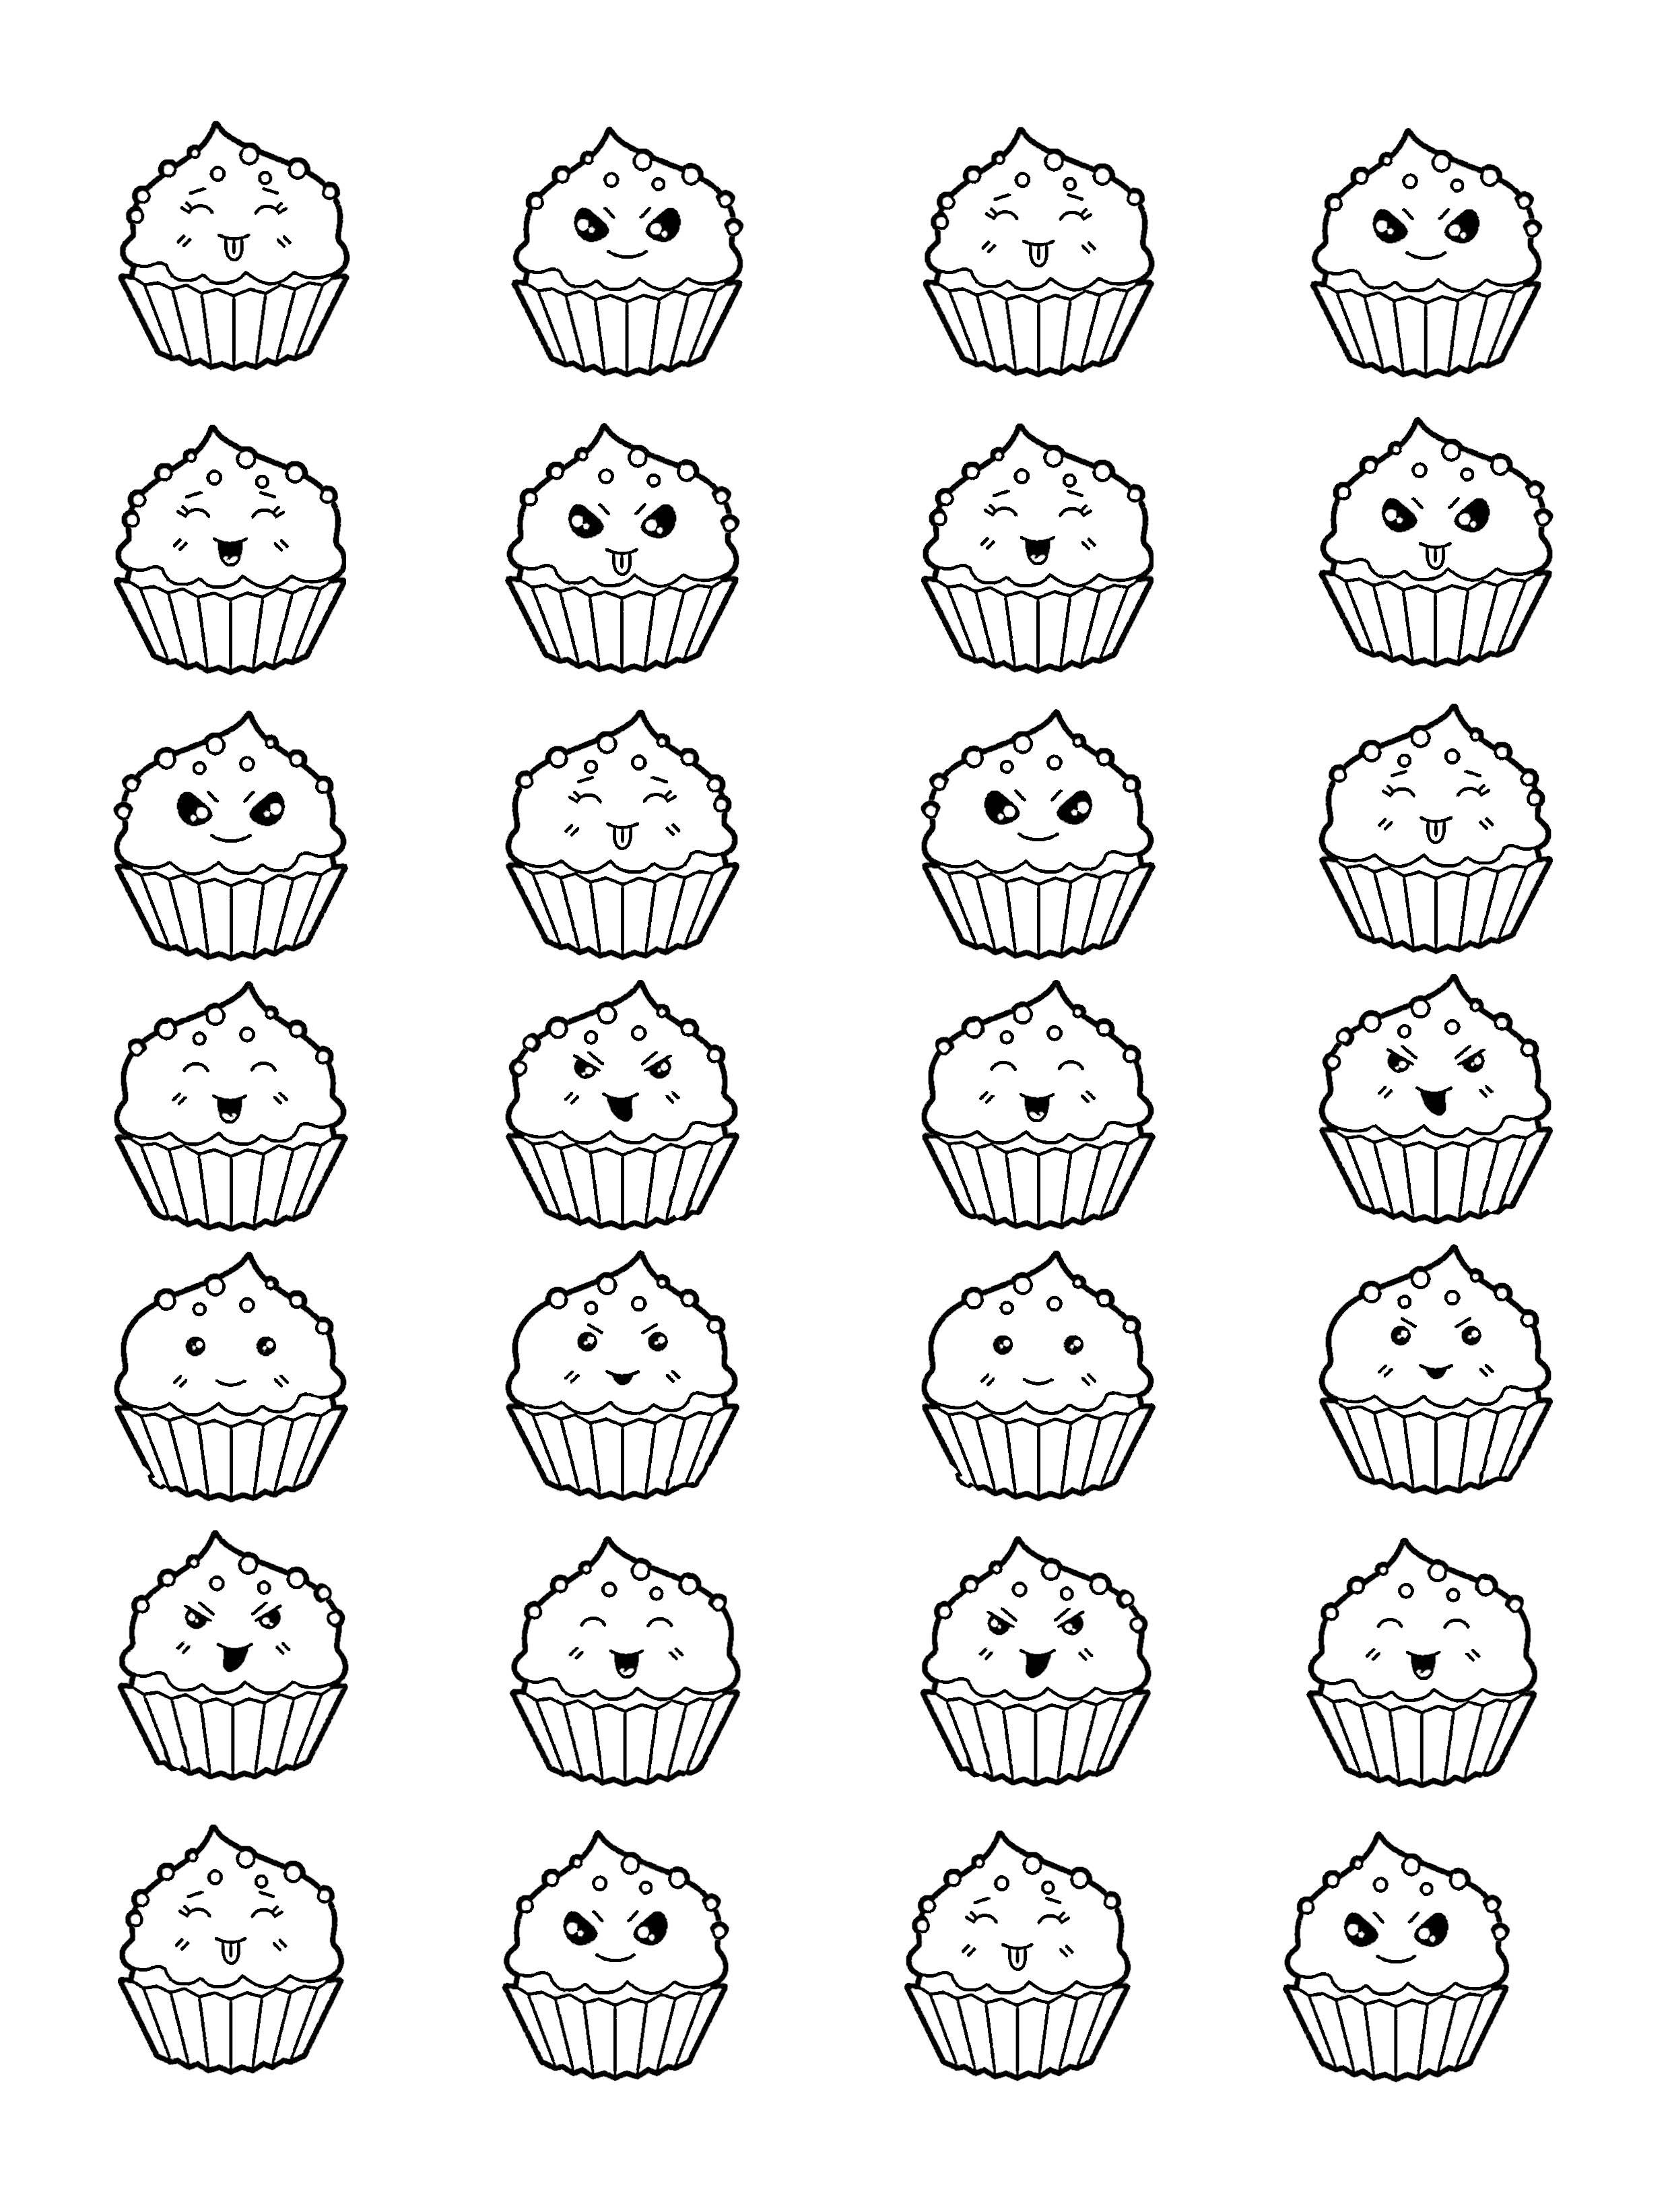 Cupcakes 21241